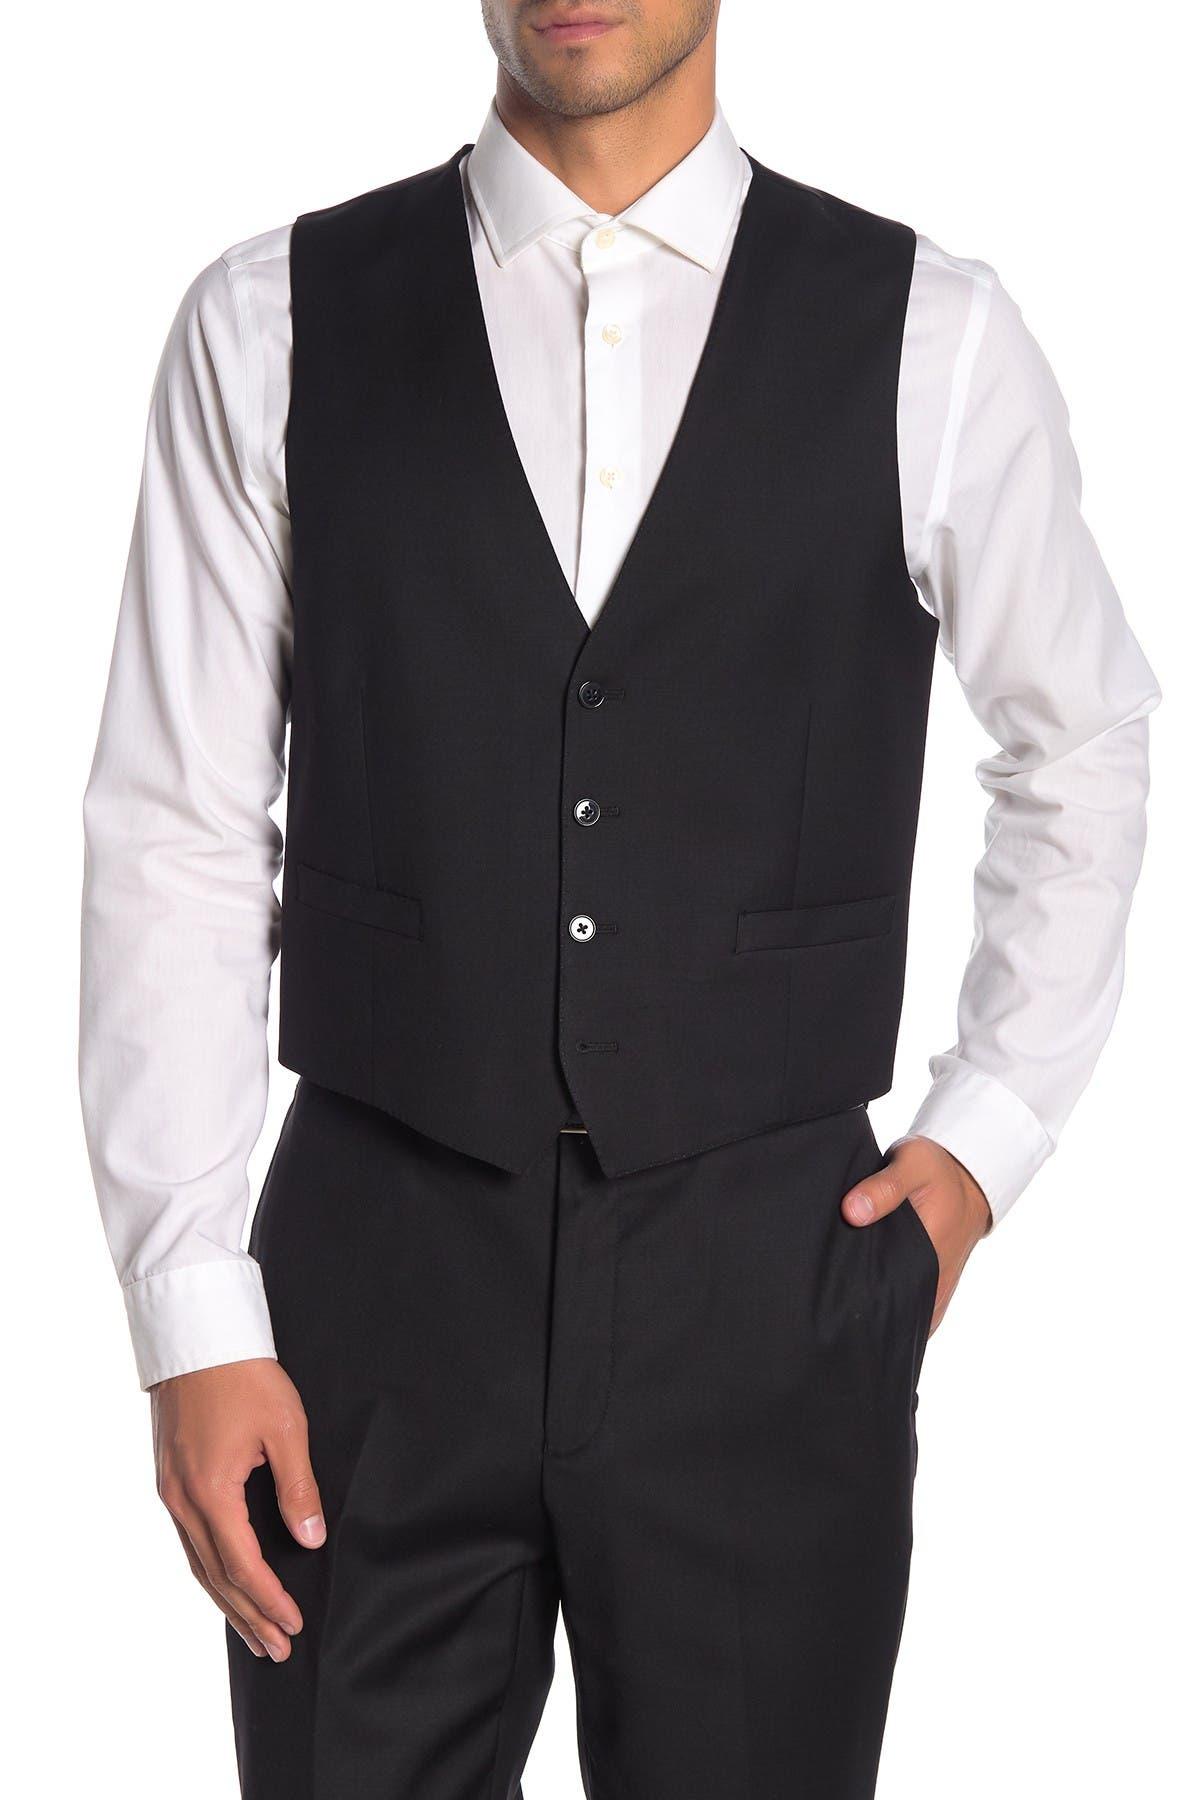 Image of Calvin Klein Black Twill Slim Fit Suit Separate Vest